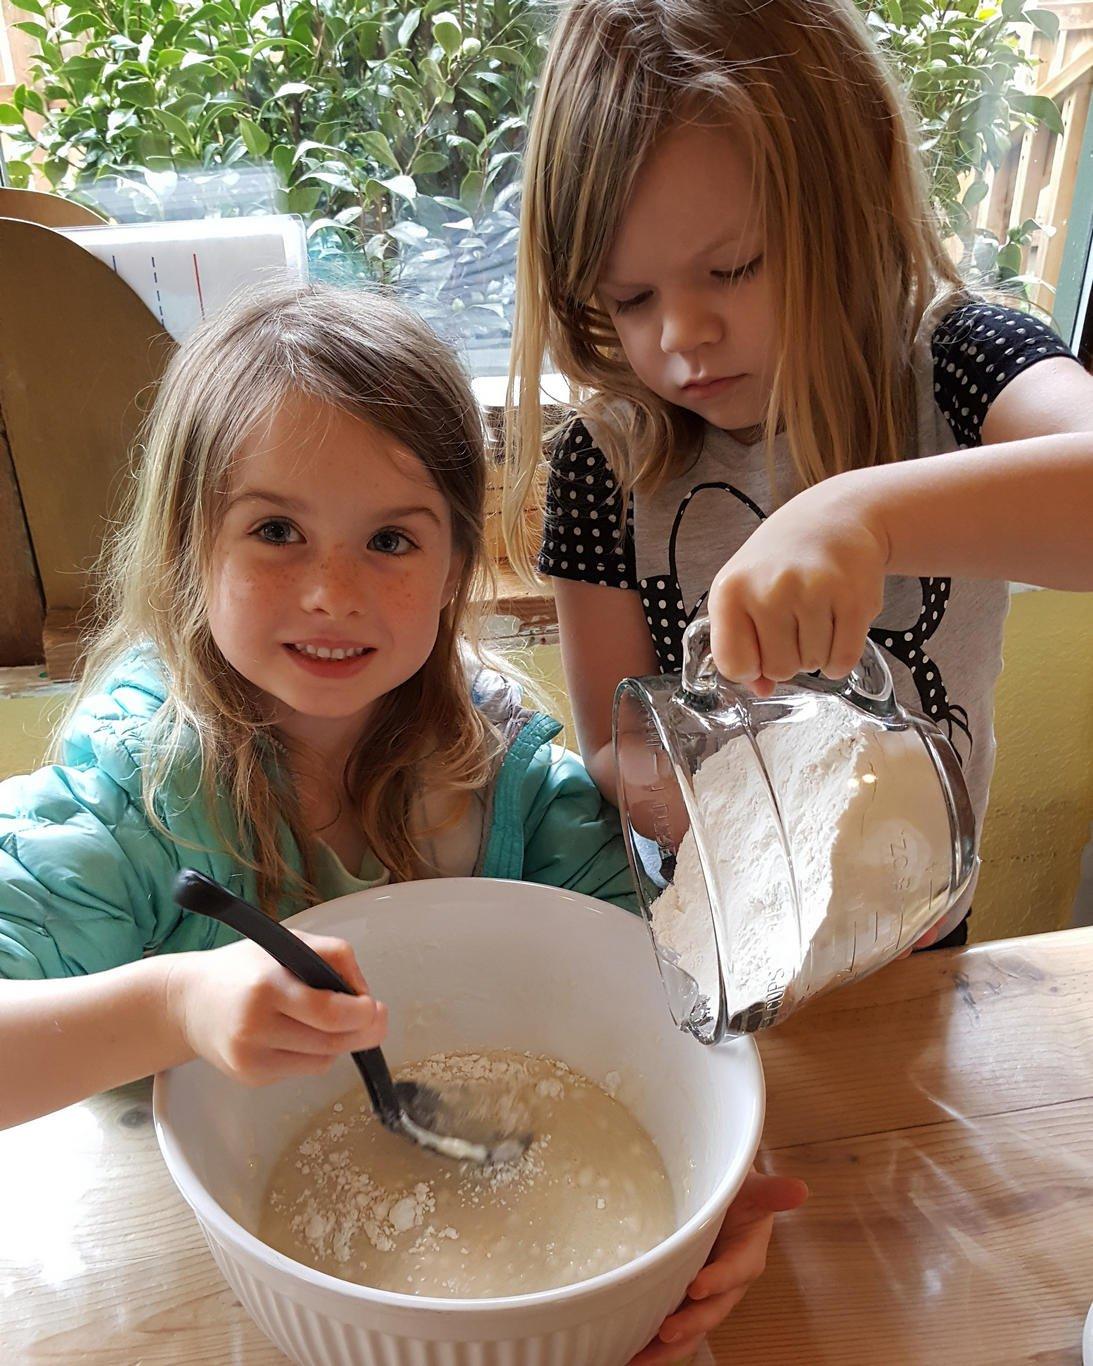 Girls learn to cook as part of preschool program